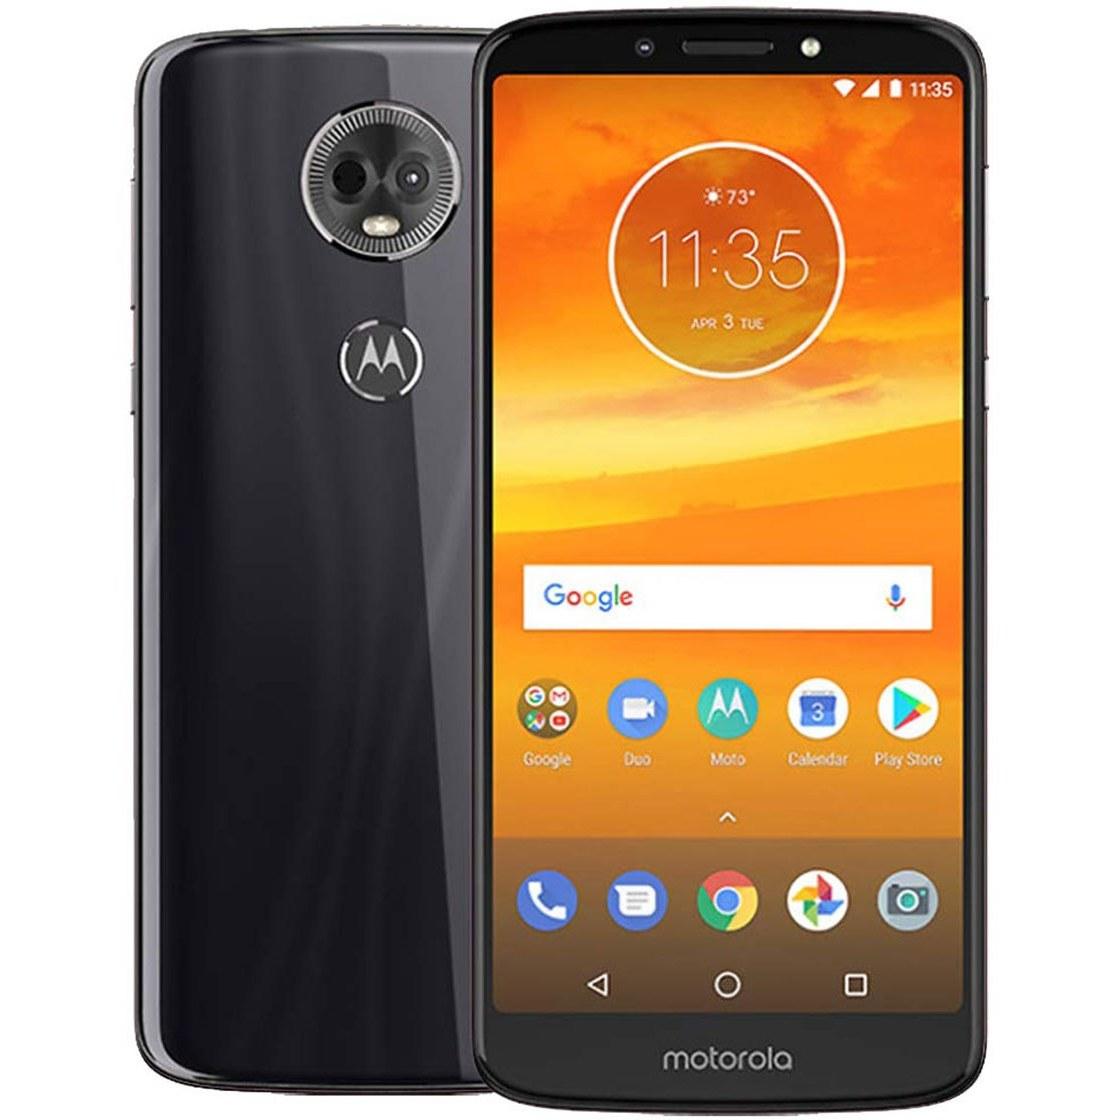 Motorola Moto E5 S | 32GB | گوشی موتورولا موتو ای 5 اس | ظرفیت 32 گیگابایت